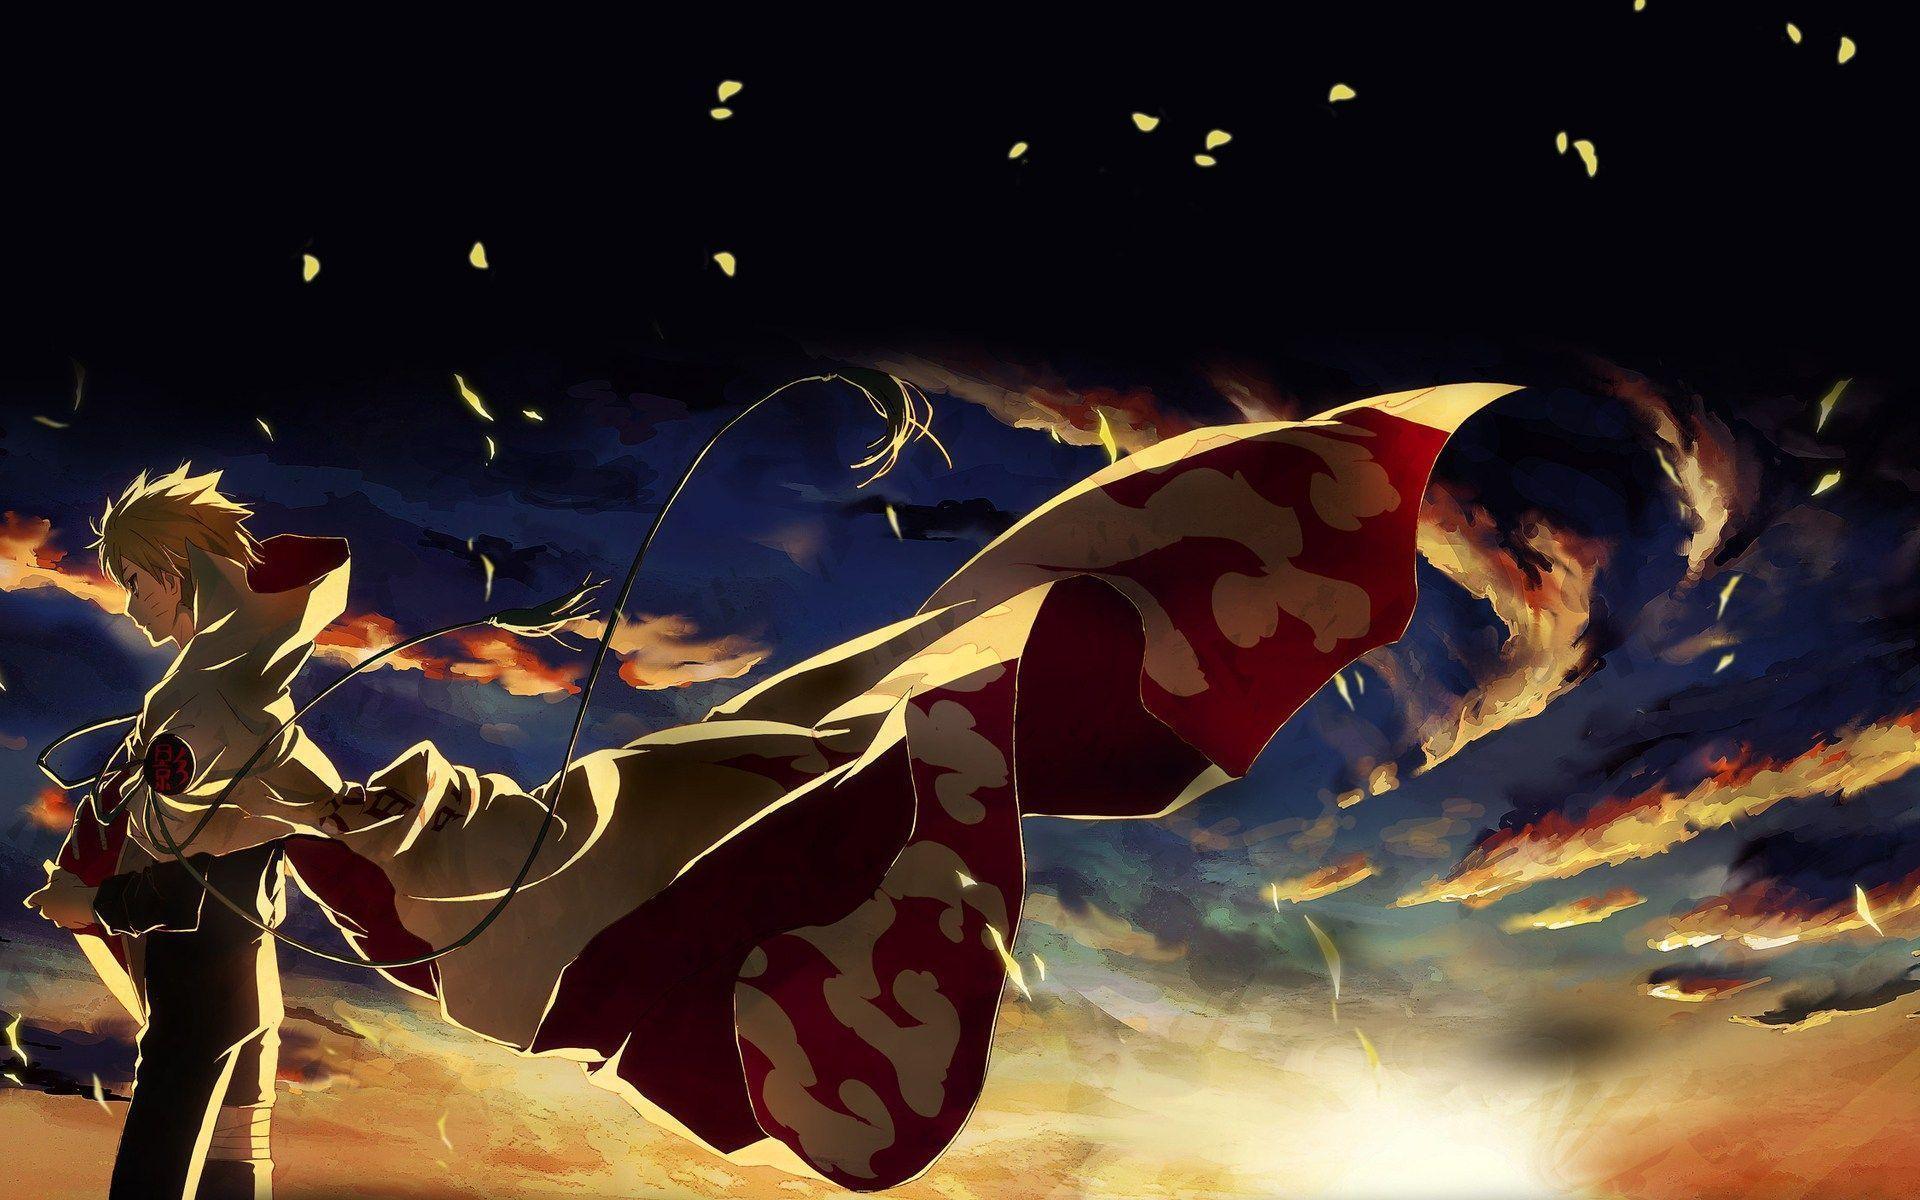 Naruto Hokage Wallpaper Hd Best Hd - WallpaperZ